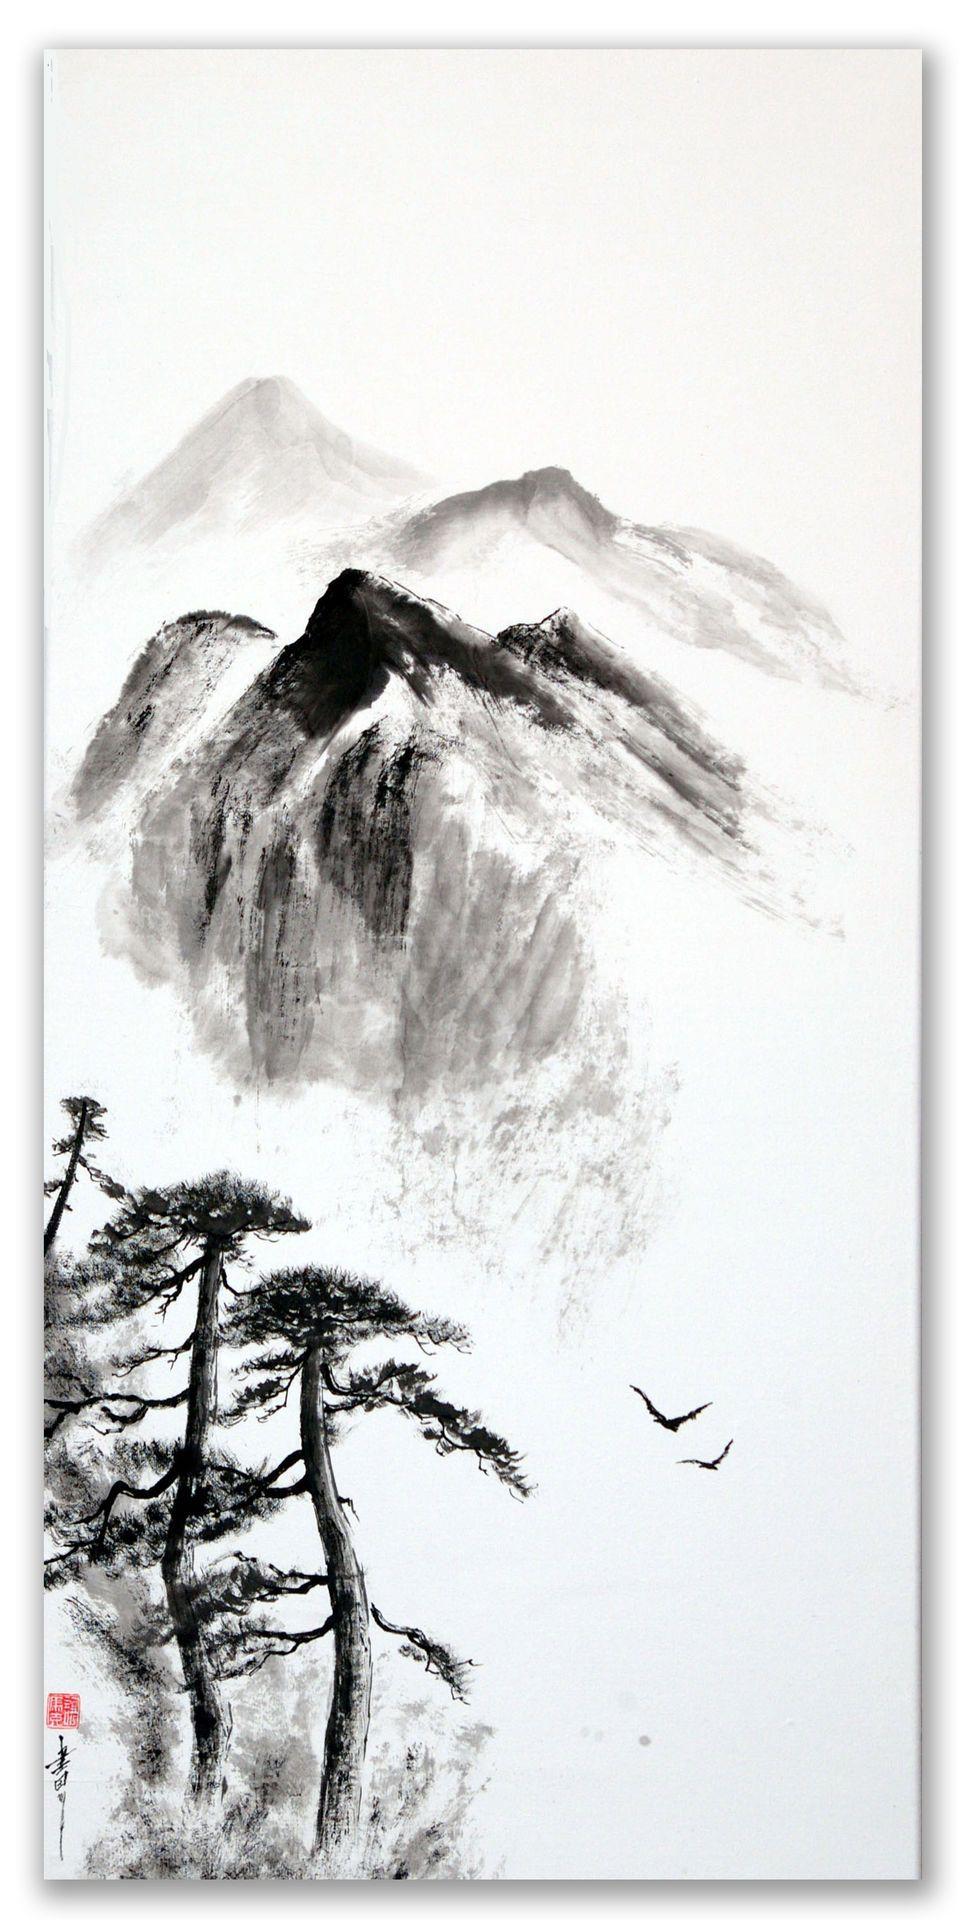 Vol A Travers Les Cimes 100x50cm La Peinture Zen Ou Sumi E